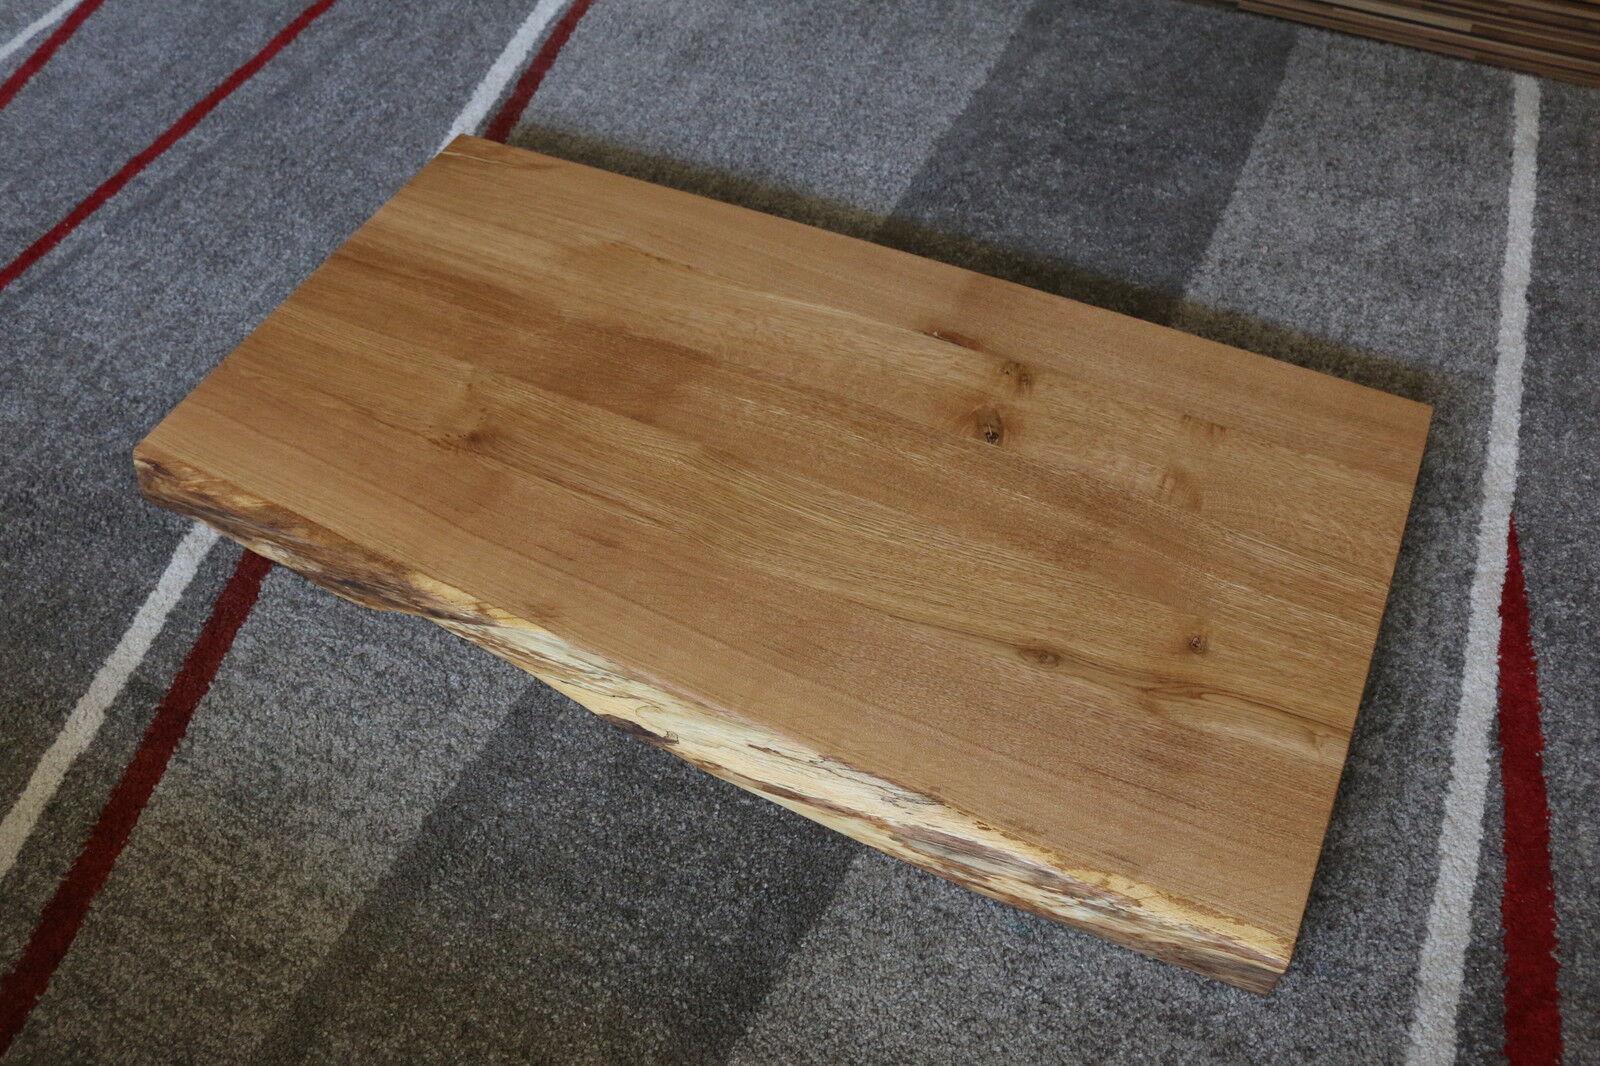 tischplatte platte eiche massiv holz tisch brett leimholz 5 5 cm stark baumkante eur 380 00. Black Bedroom Furniture Sets. Home Design Ideas